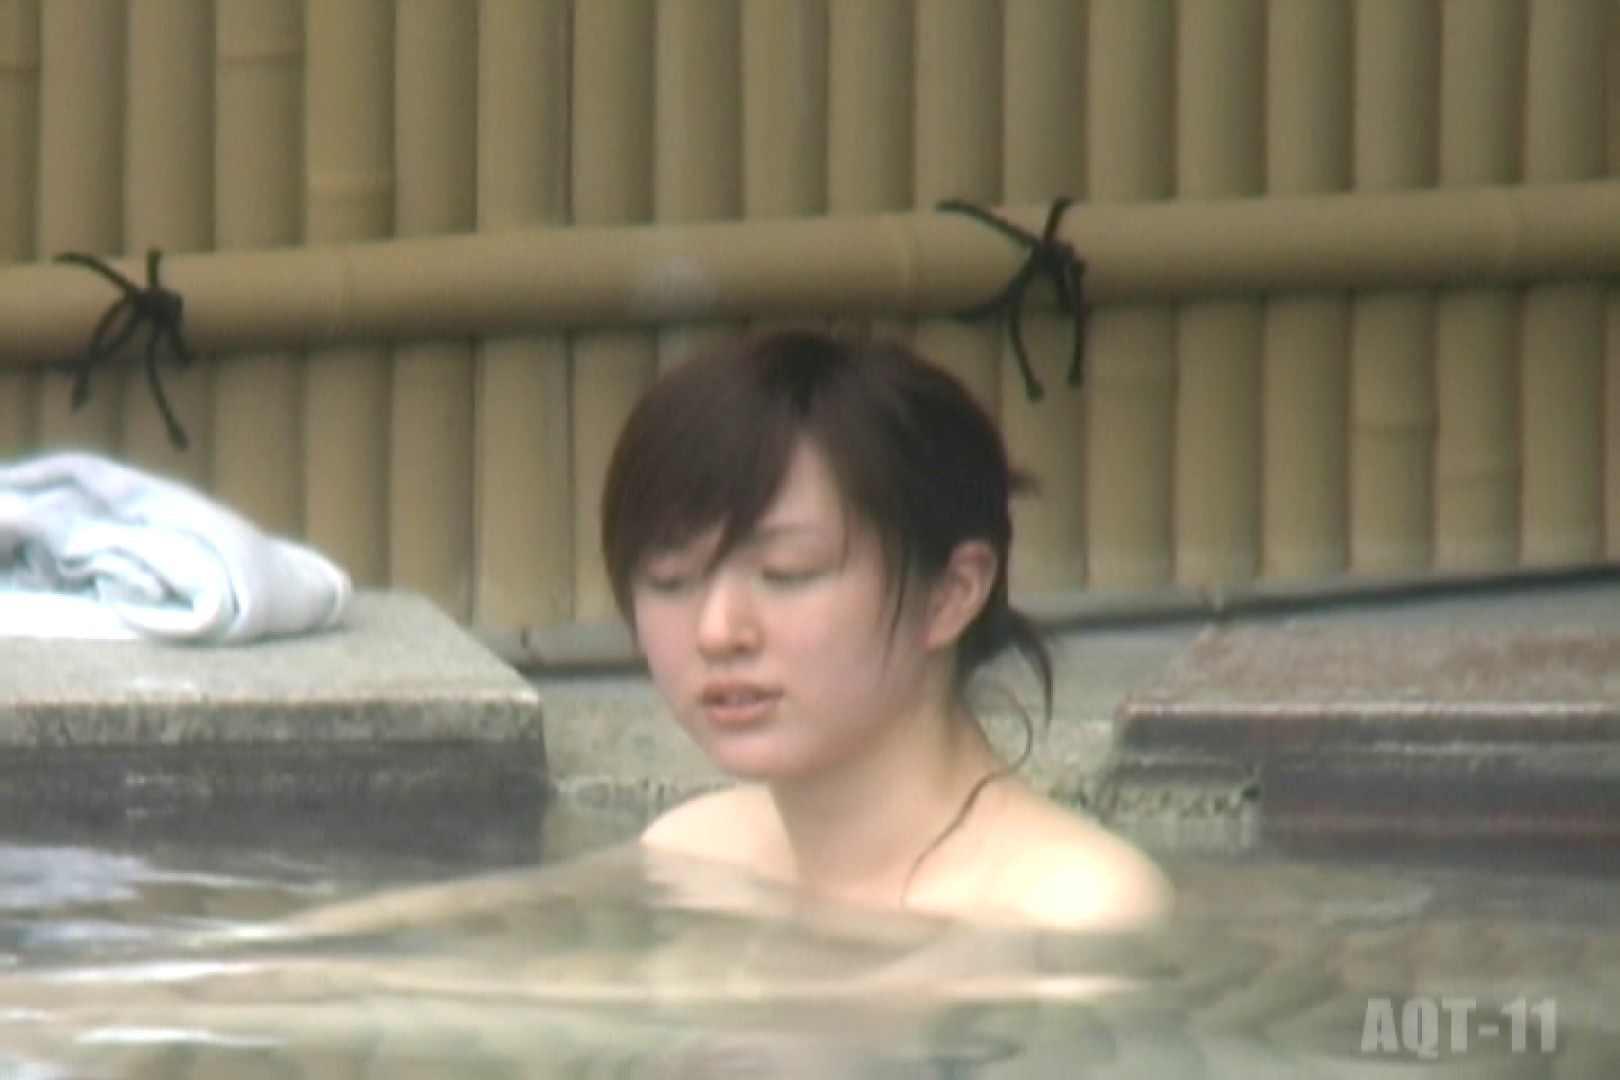 Aquaな露天風呂Vol.798 HなOL AV無料動画キャプチャ 109pic 107